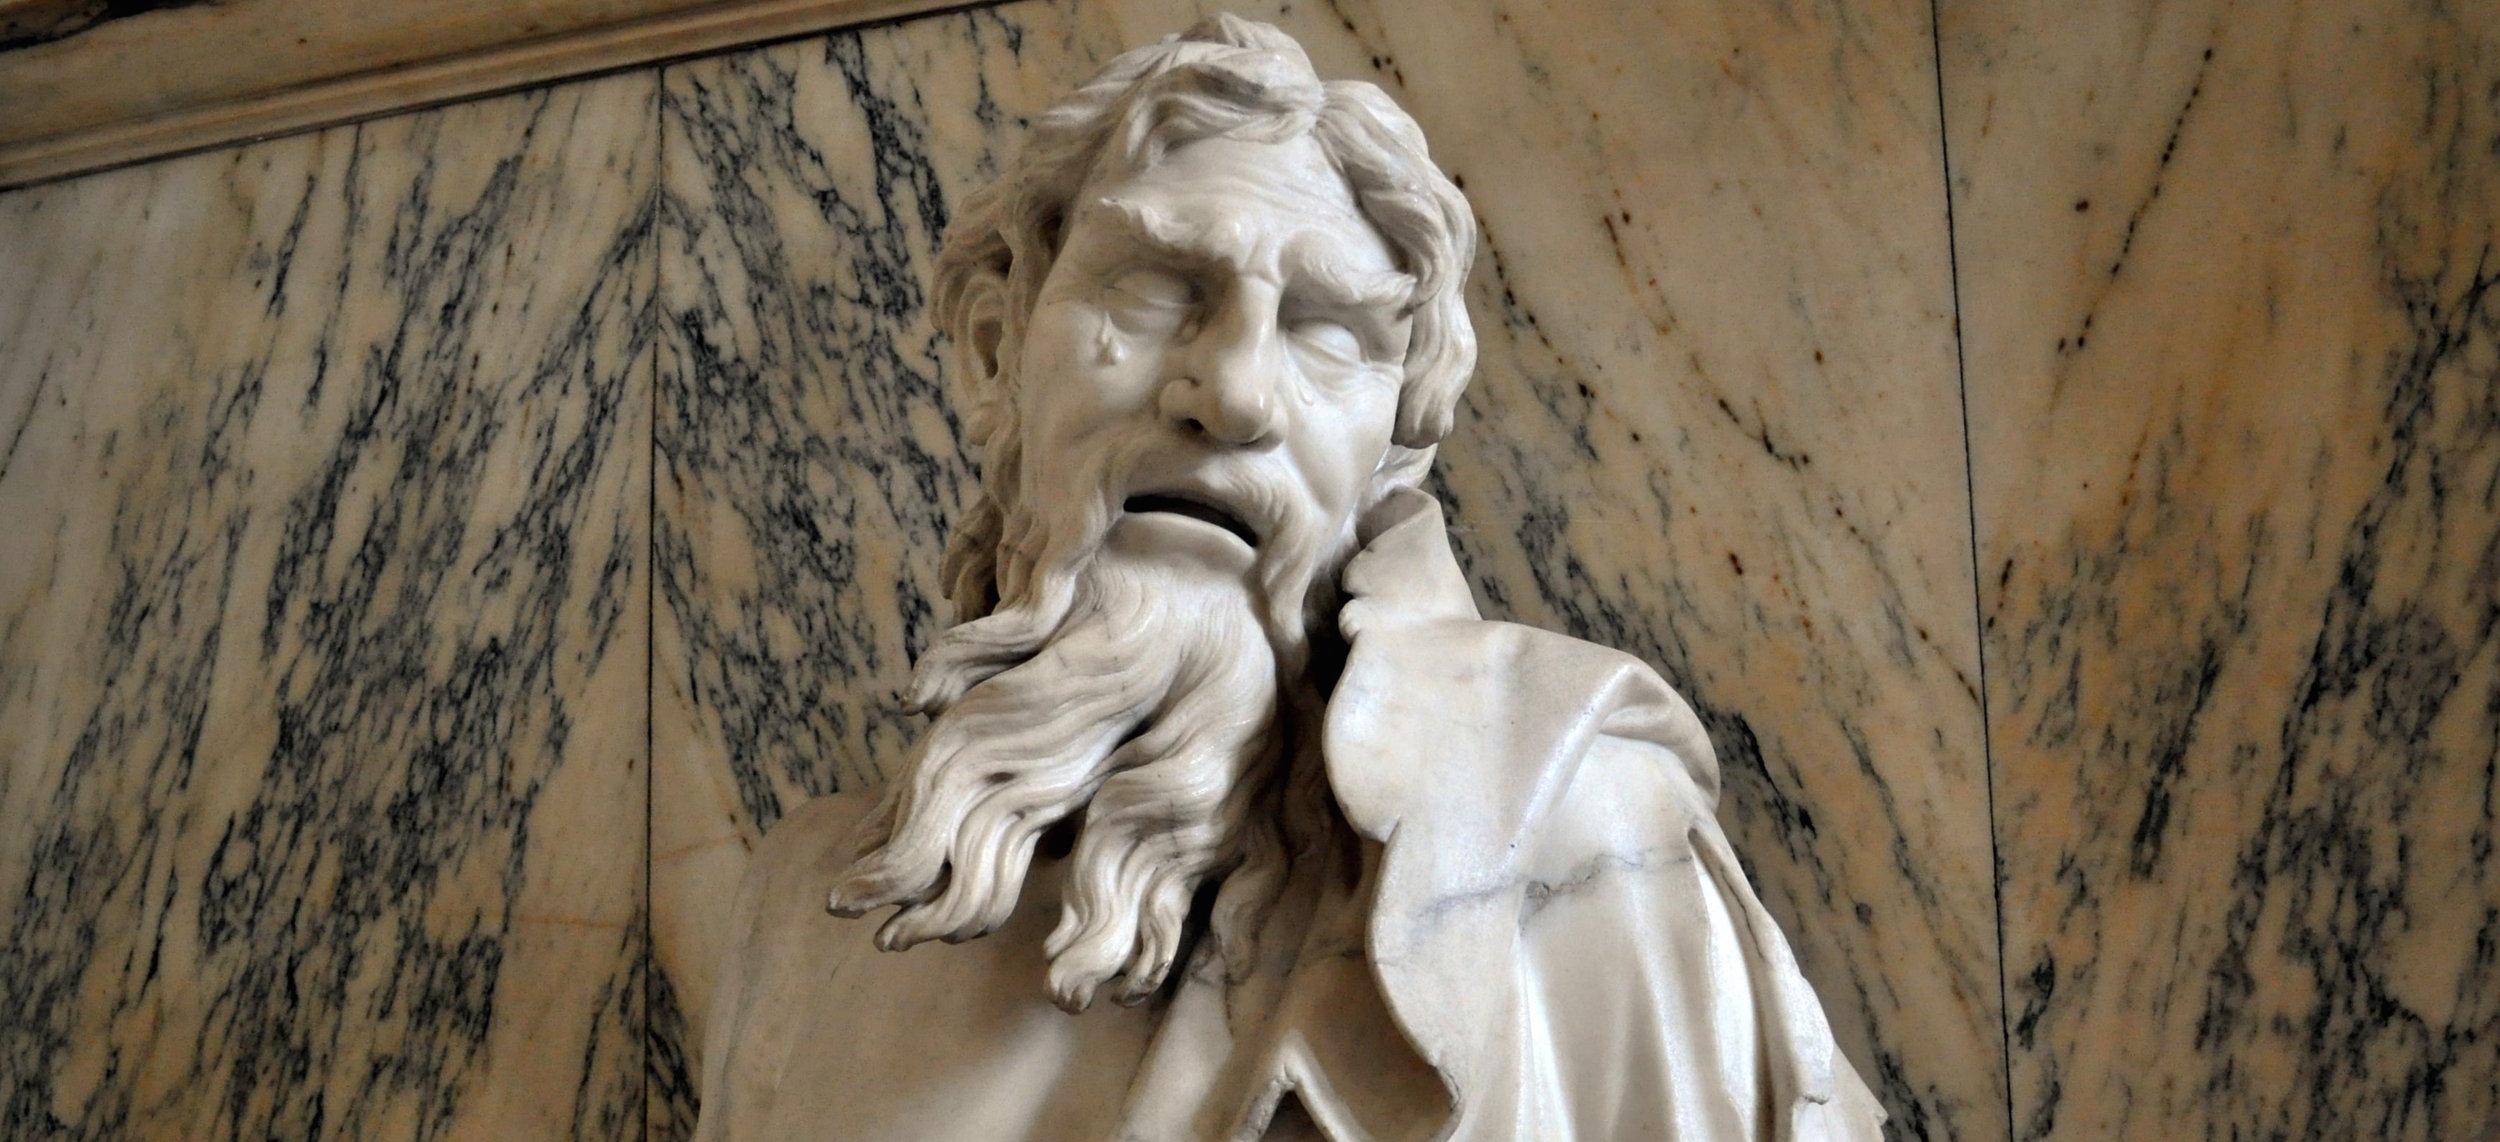 Bust_of_Heraclitus_-_Victoria_and_Albert_Museum.jpg